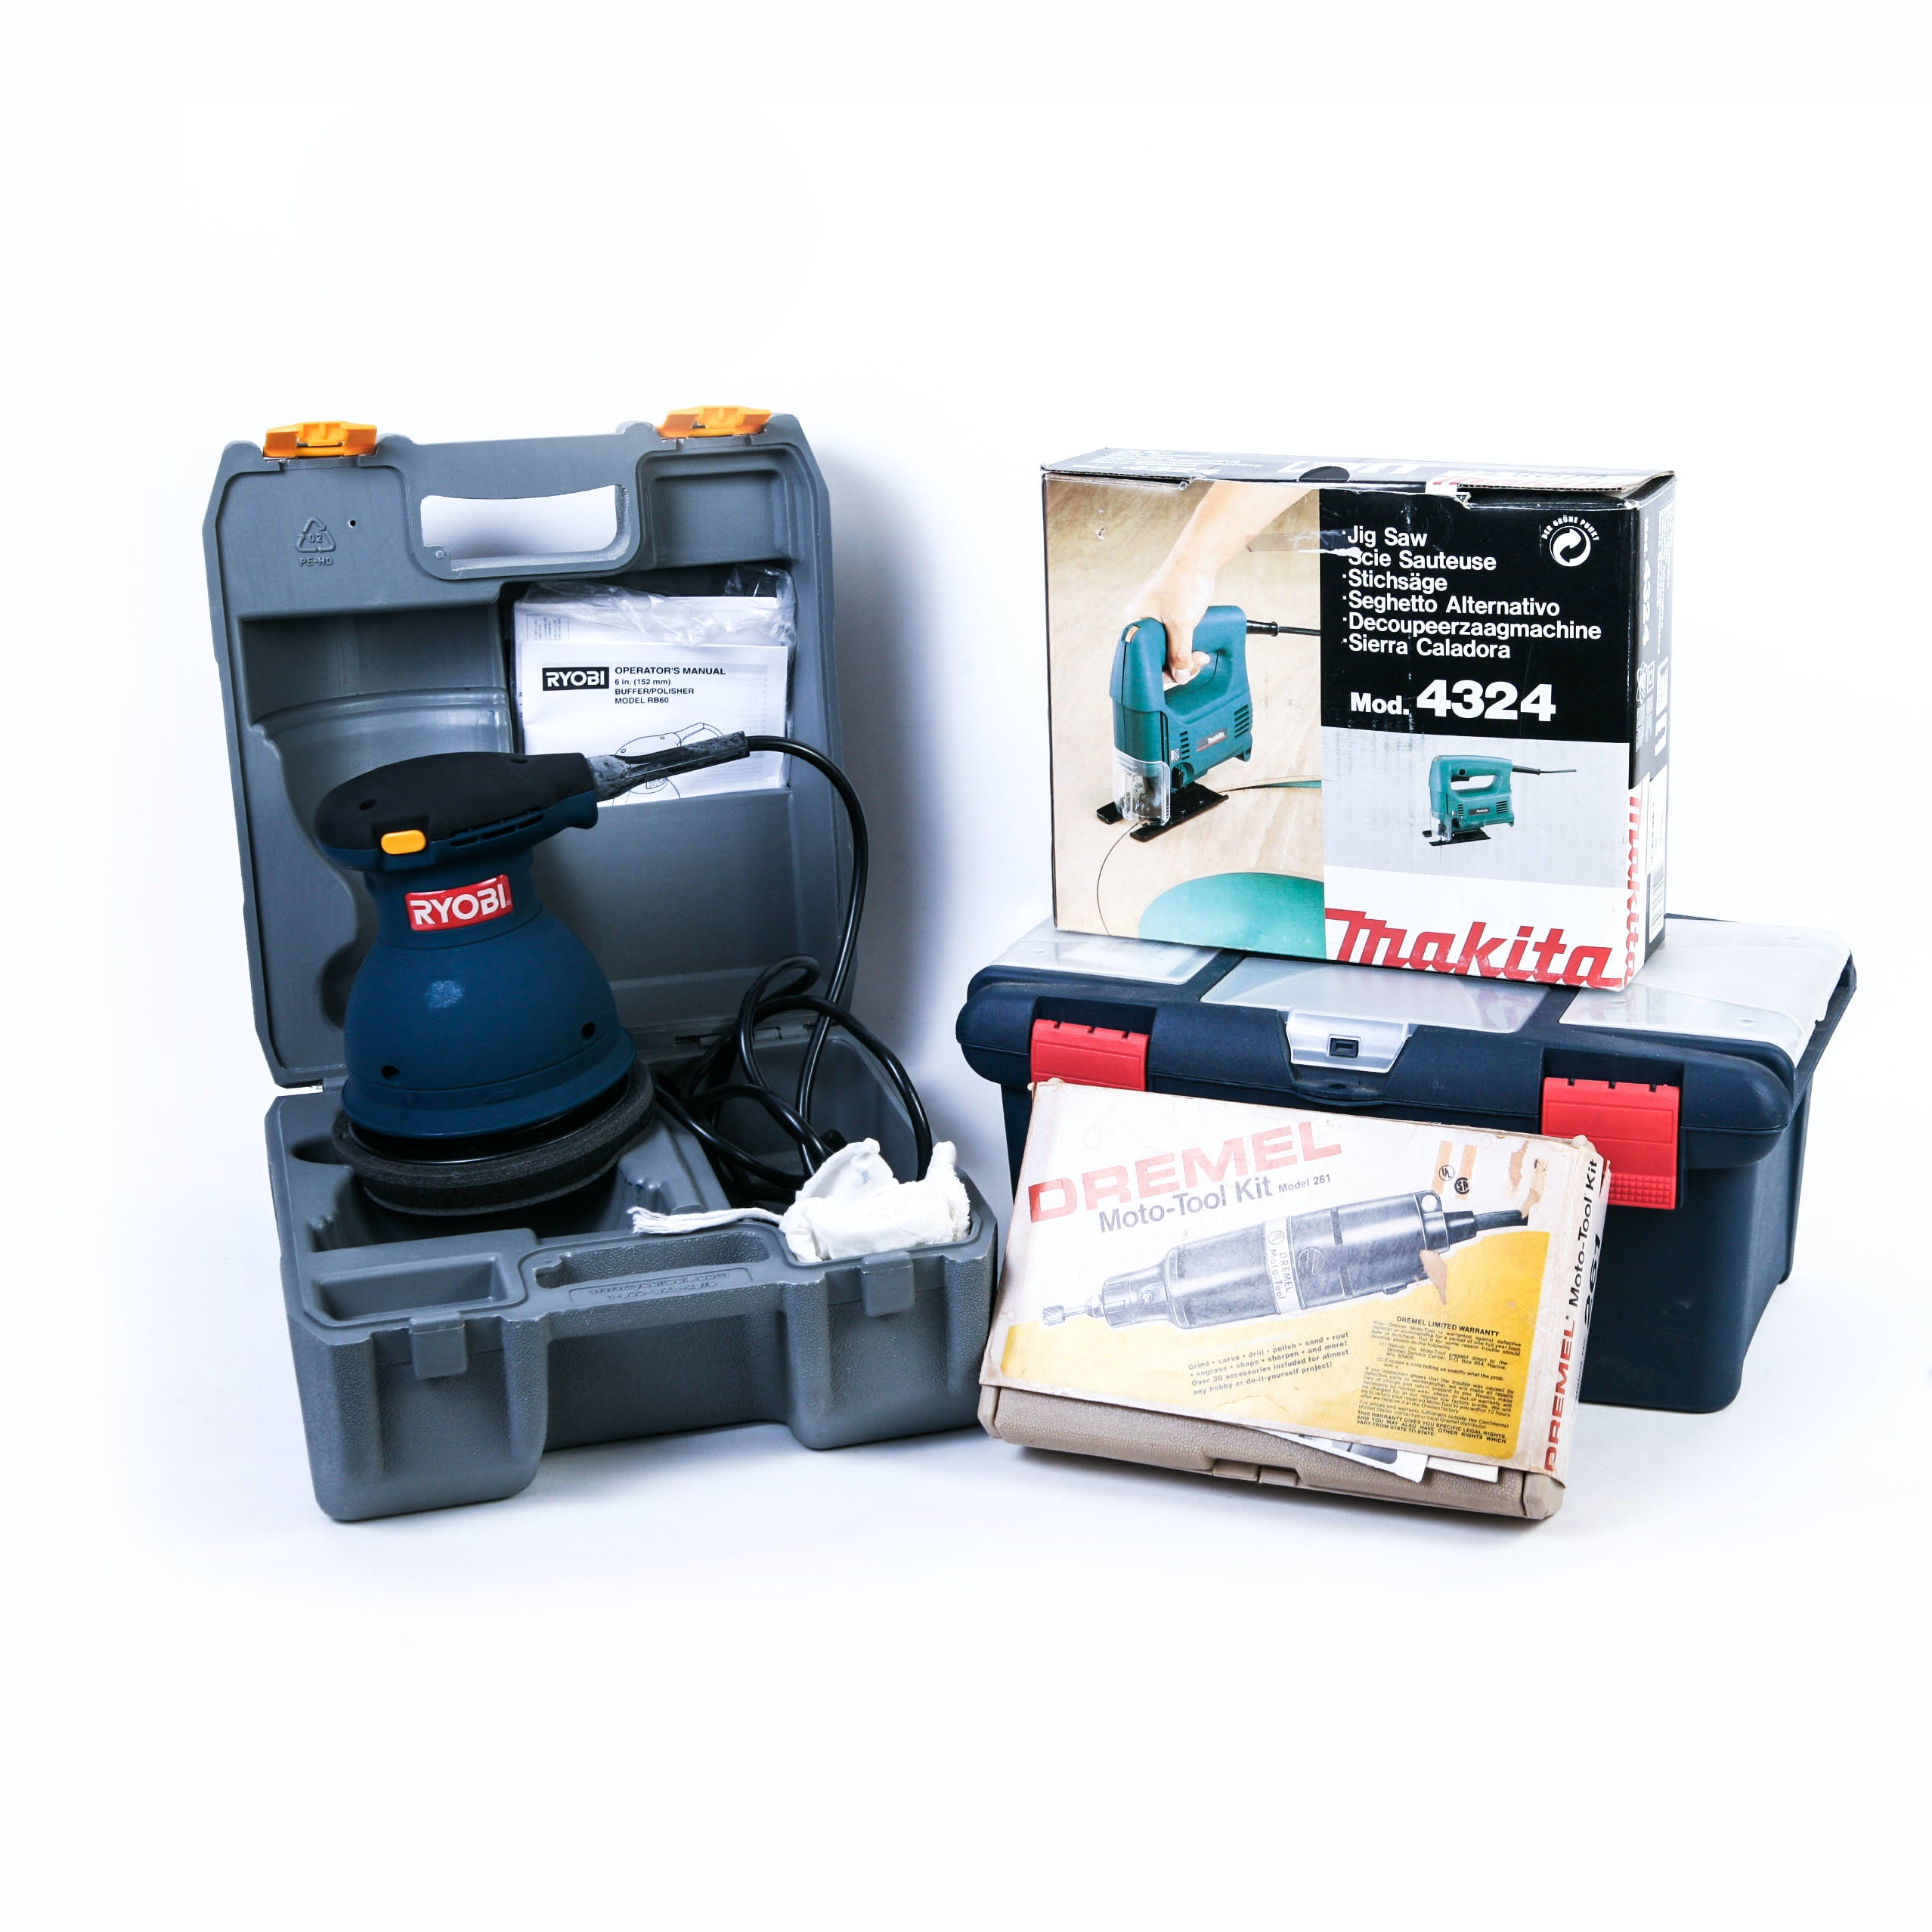 Six Inch Ryobi Orbital Buffer, Thakita Jig Saw, Dremel Moto-Tool Kit, and Toolbox